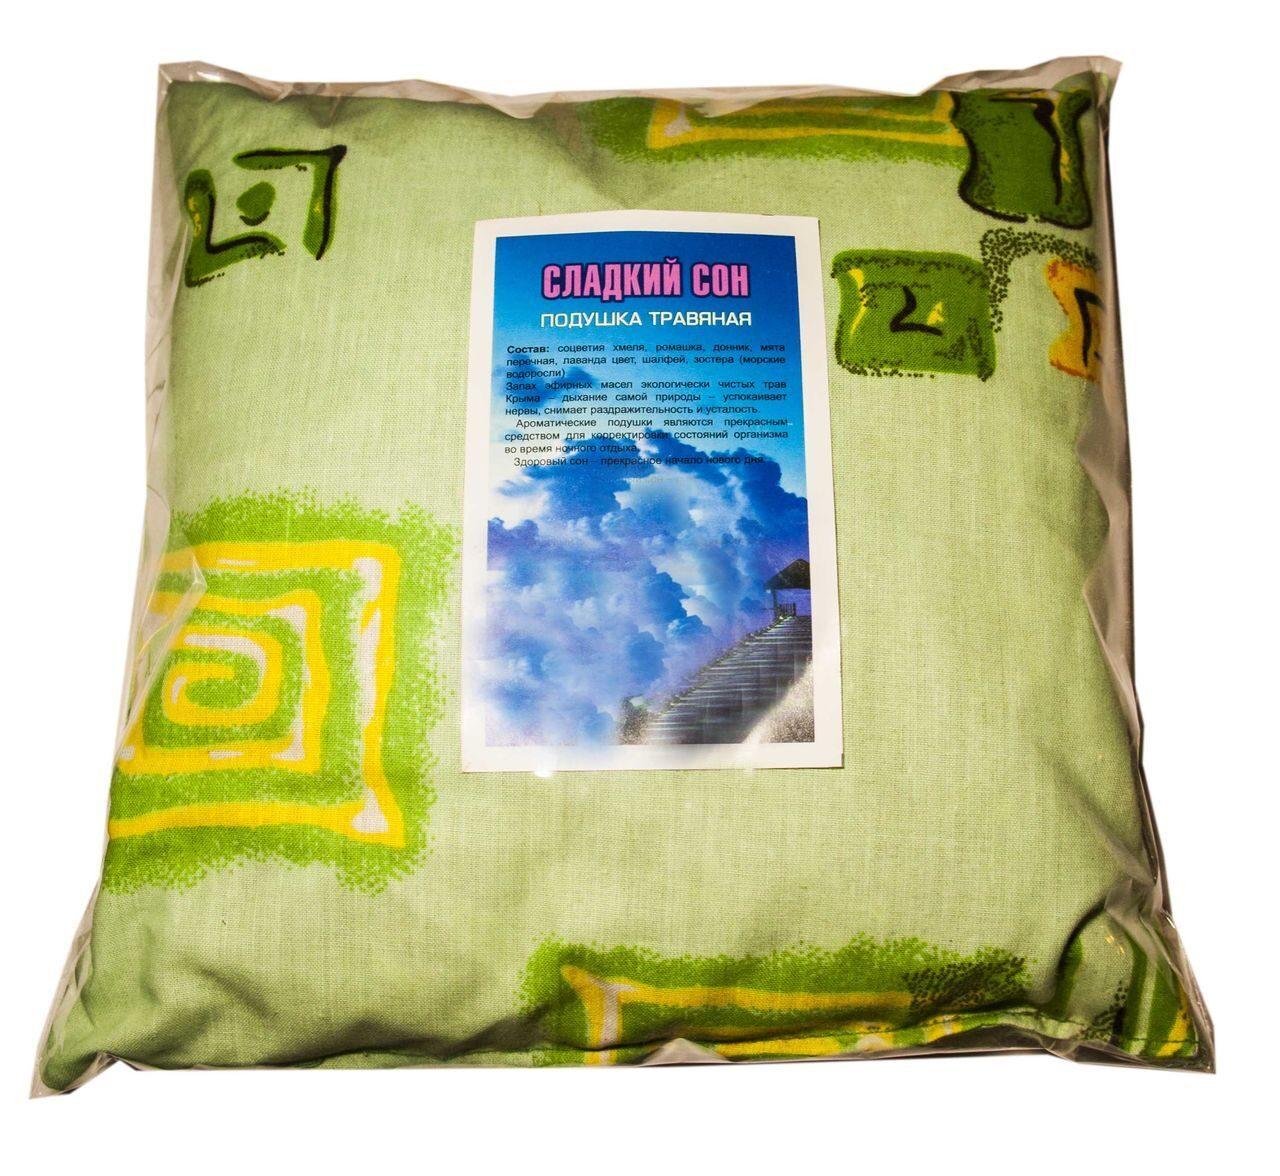 Подушка с травами своими руками